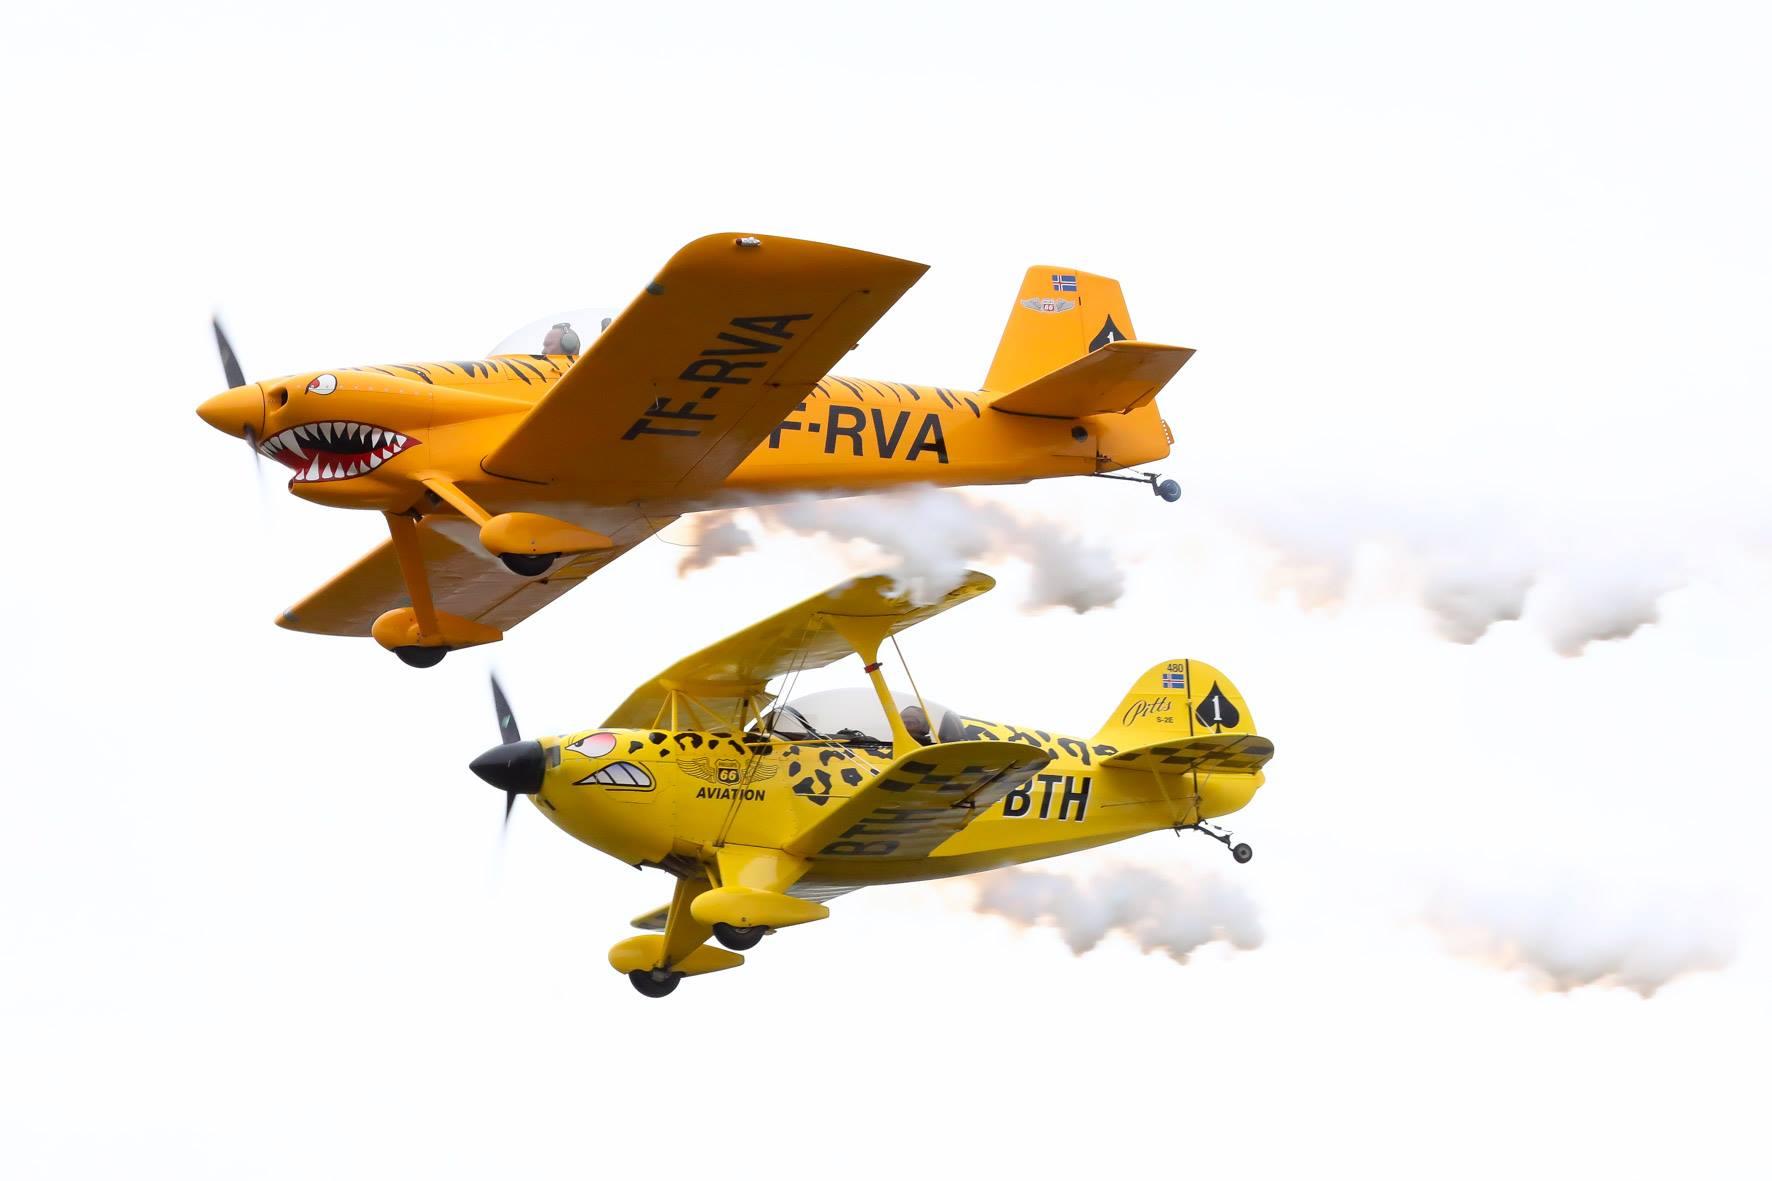 Group flight of Vans RV-4 reg. TF-RVA, piloted by Guðjón Jóhannesson, and Pitts S-2E reg. TF-BTH, piloted by Sigurður Ásgeirsson // Source: Hörður Geirsson